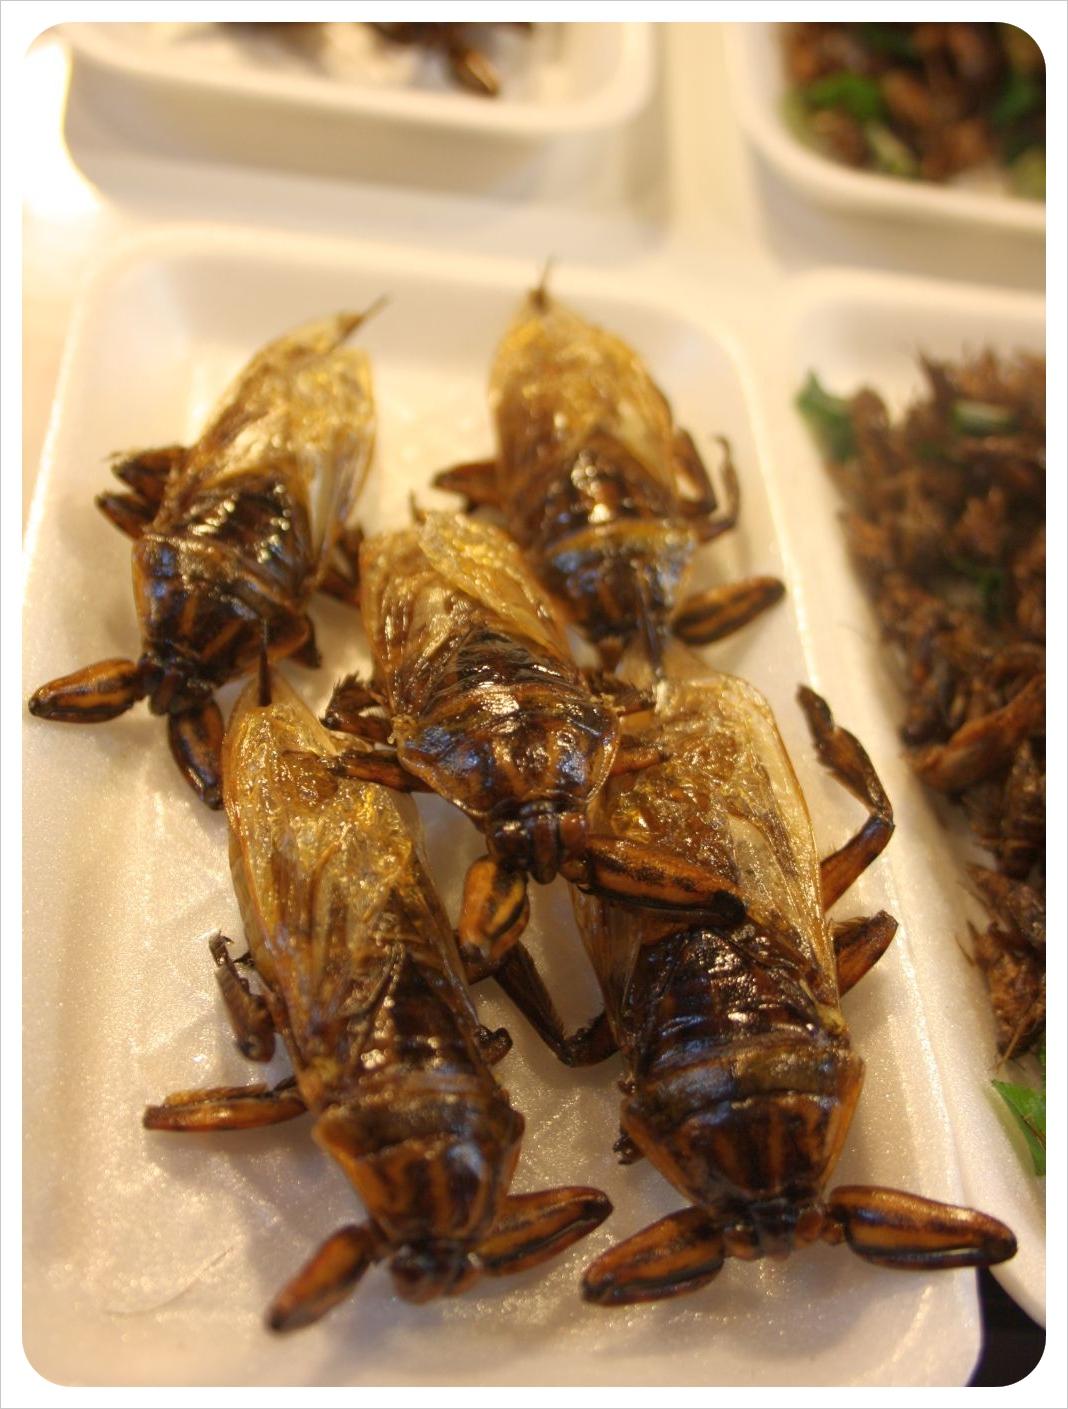 chiang rai fired crickets